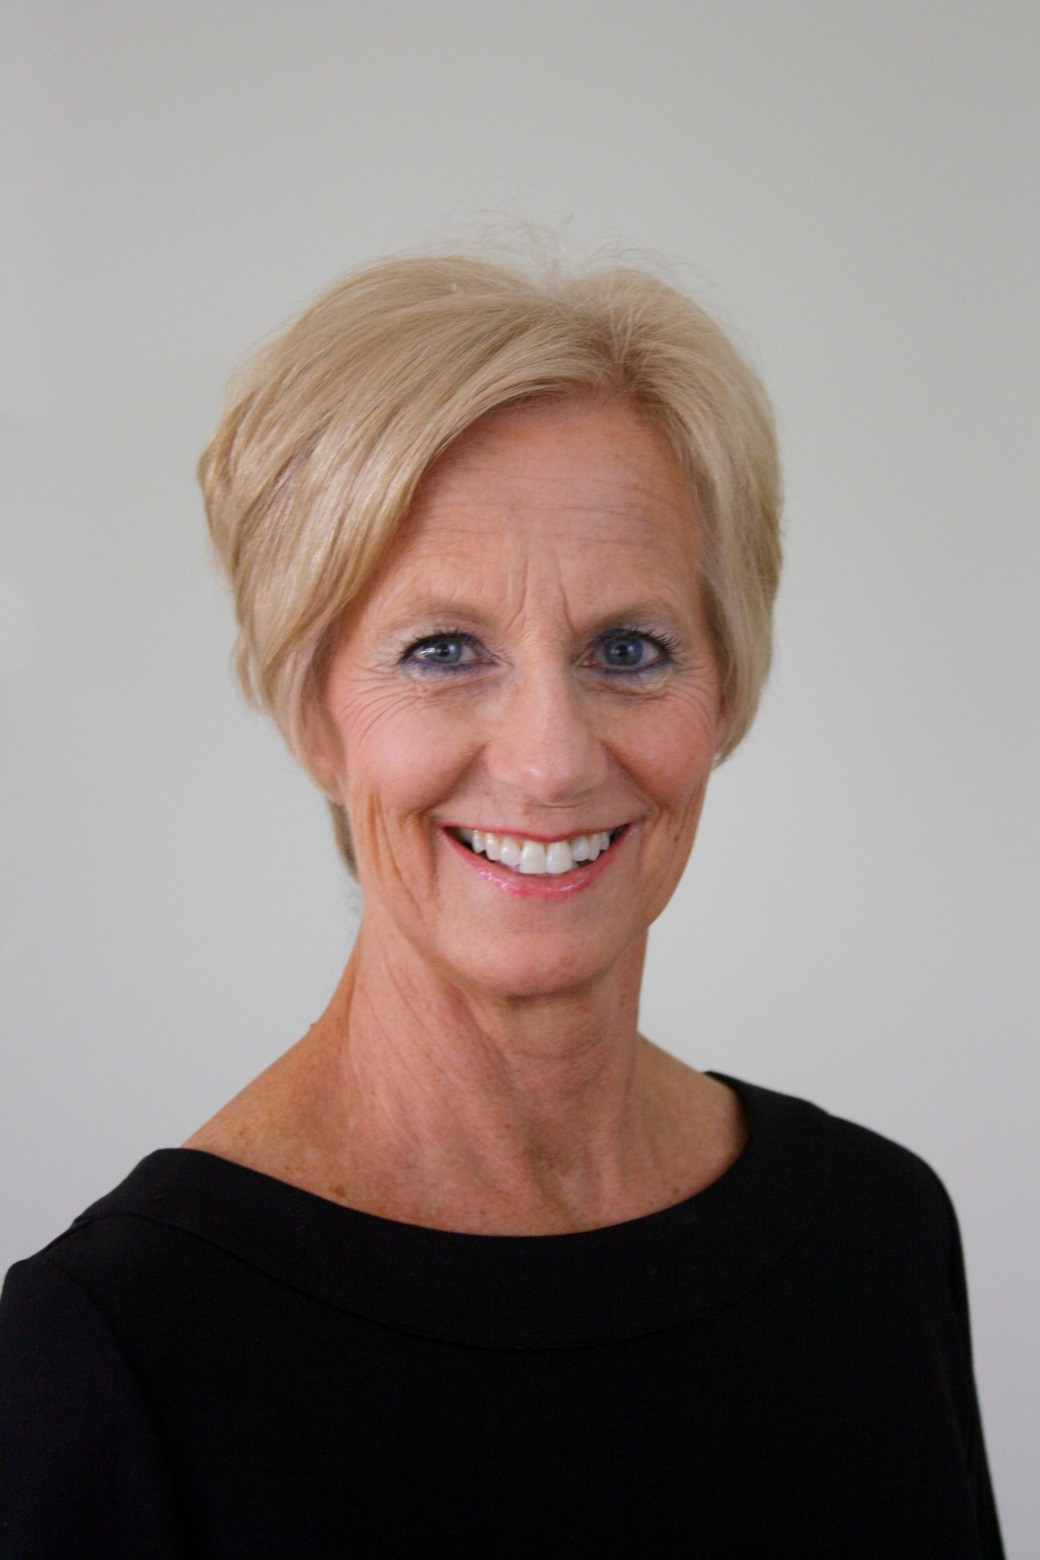 Helen Owens